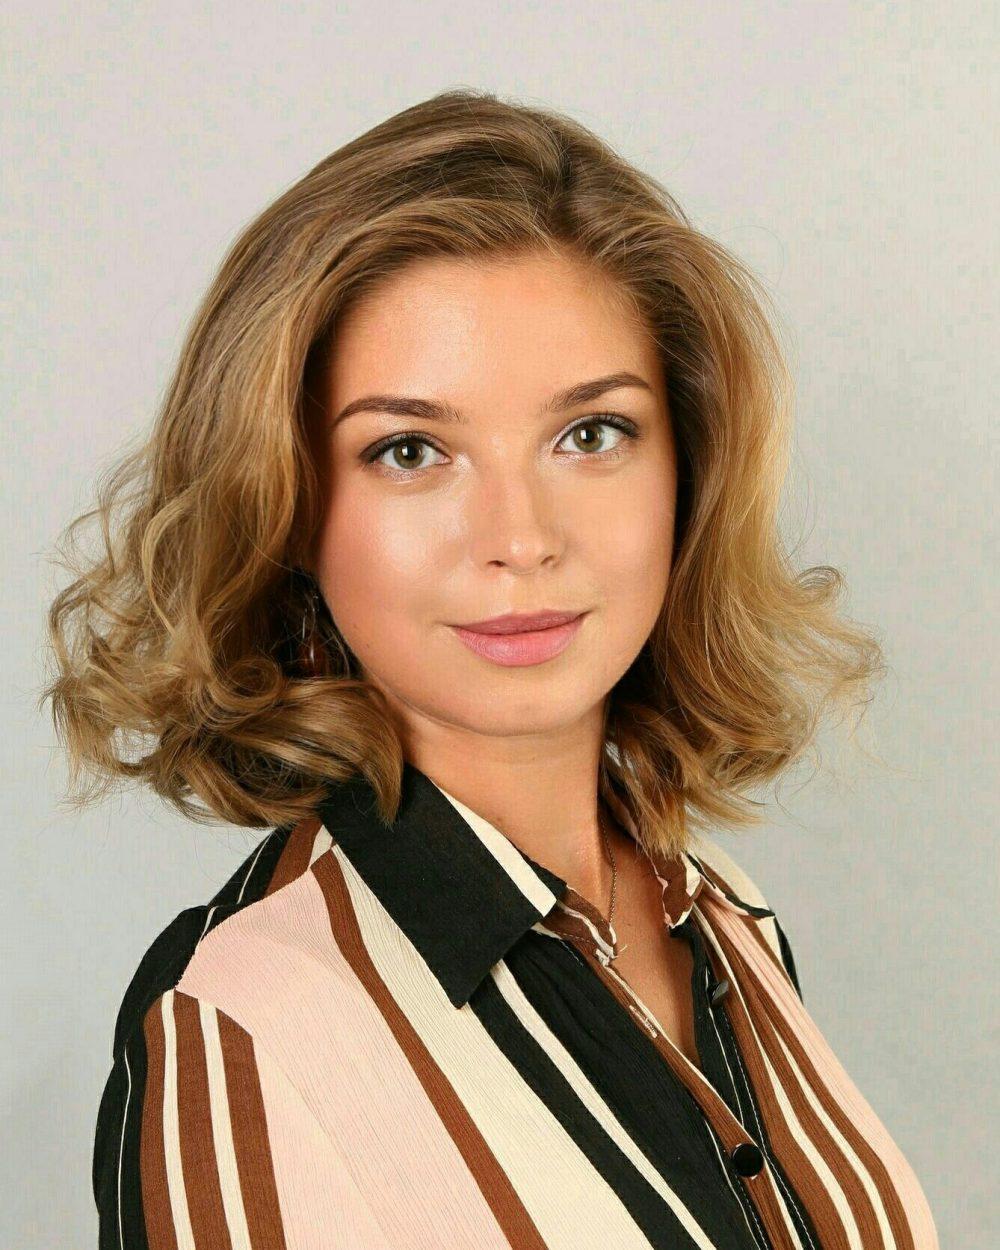 Коцик Кристина Эдуардовна